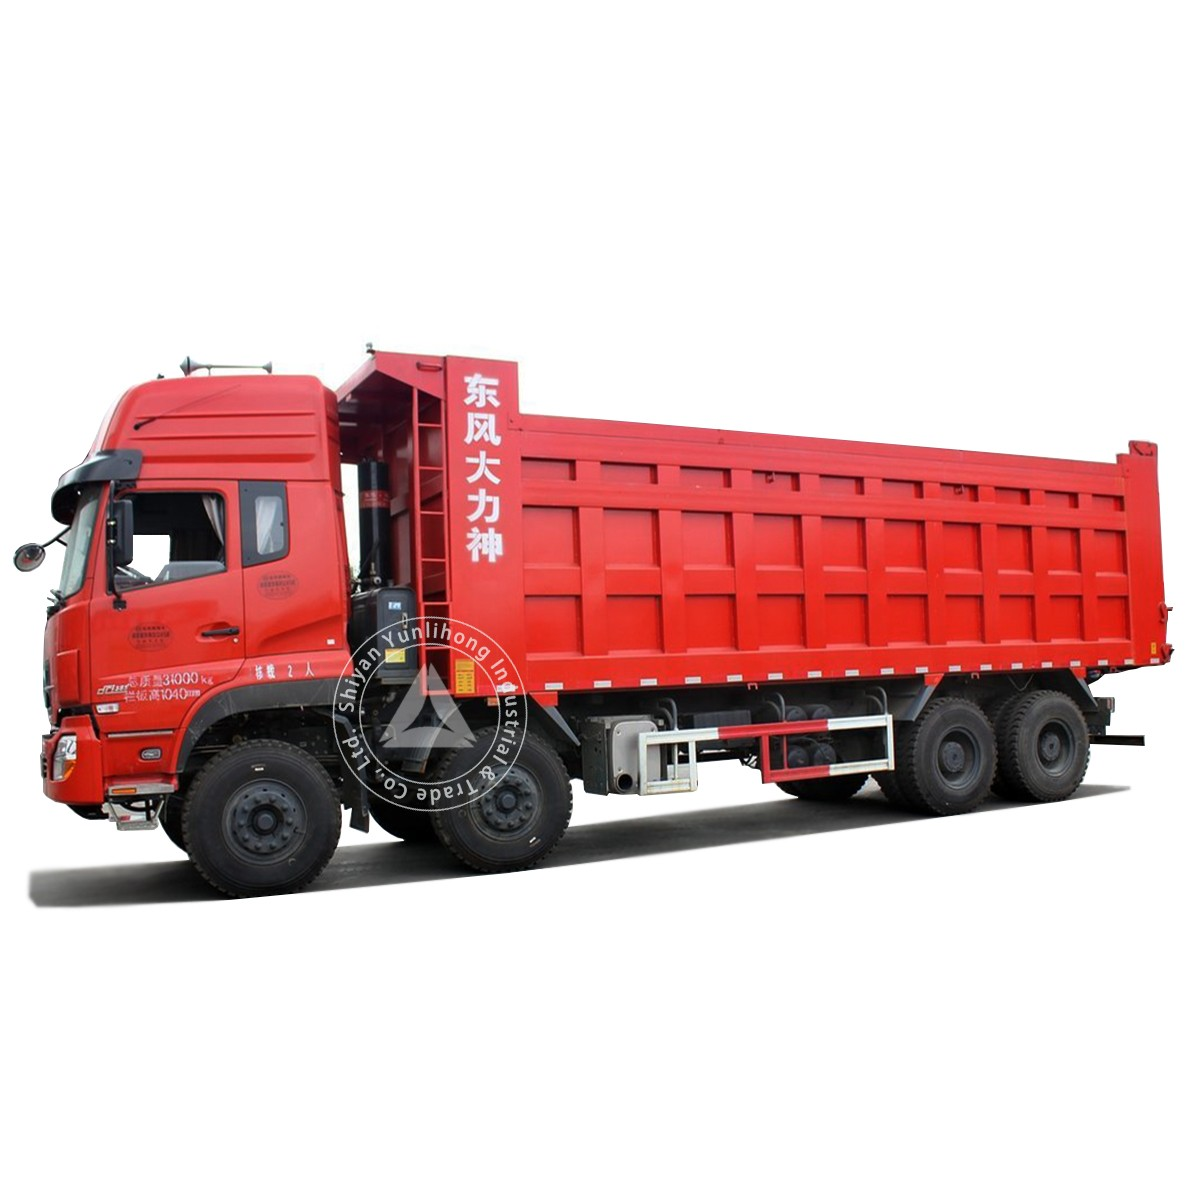 Dongfeng KC 8x4 GVW 40 Ton 23m3 To 30m3 Dump Truck Manufacturers, Dongfeng KC 8x4 GVW 40 Ton 23m3 To 30m3 Dump Truck Factory, Supply Dongfeng KC 8x4 GVW 40 Ton 23m3 To 30m3 Dump Truck